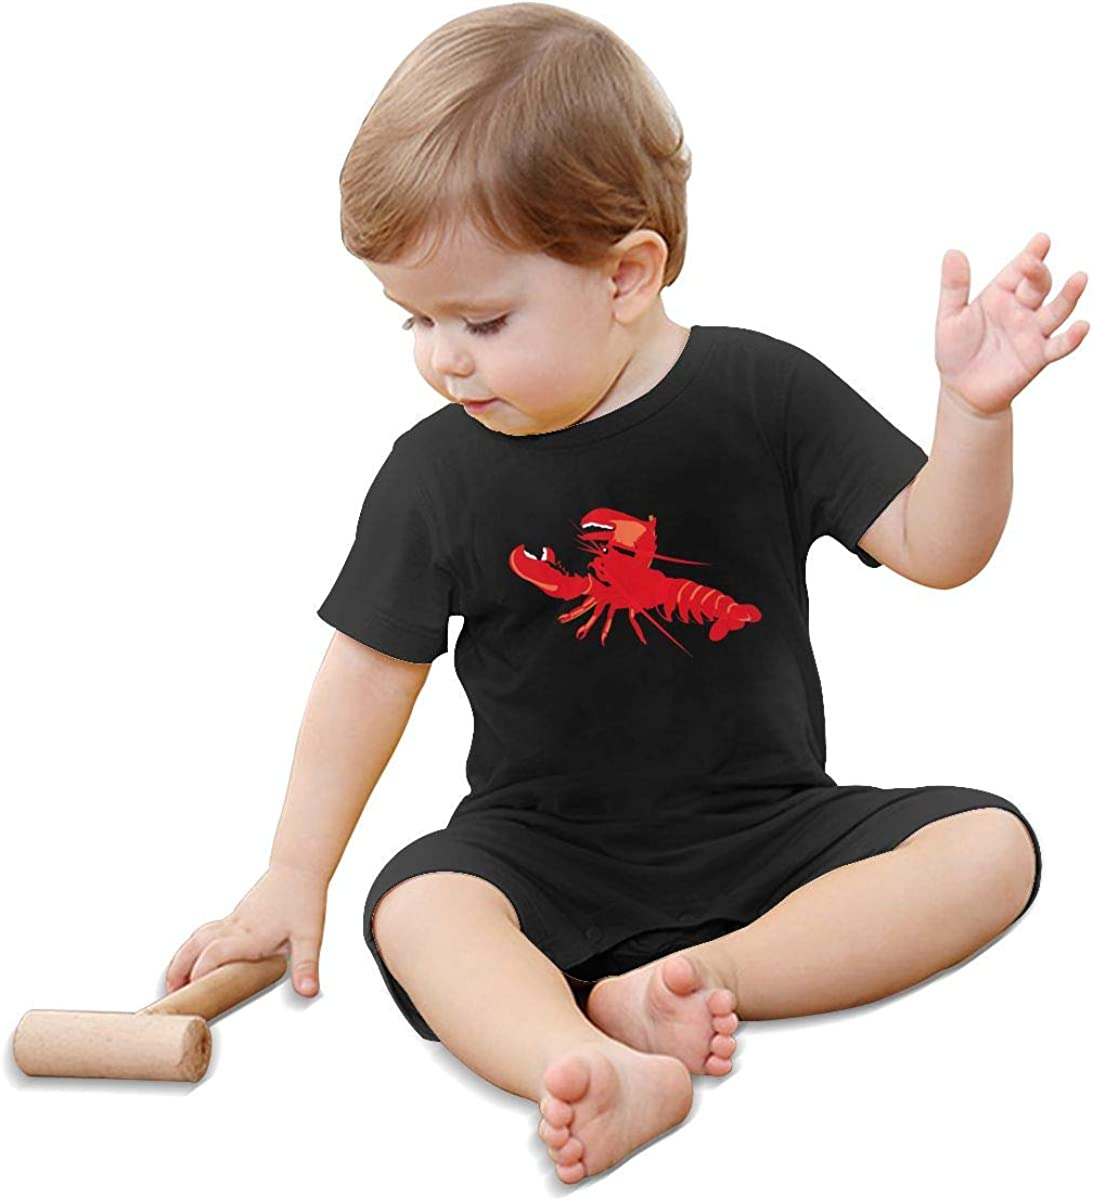 KBIZO-zxl Baby Short Sleeve Bodysuit Lobster Baby Boys Girls Onesie Clothes Black